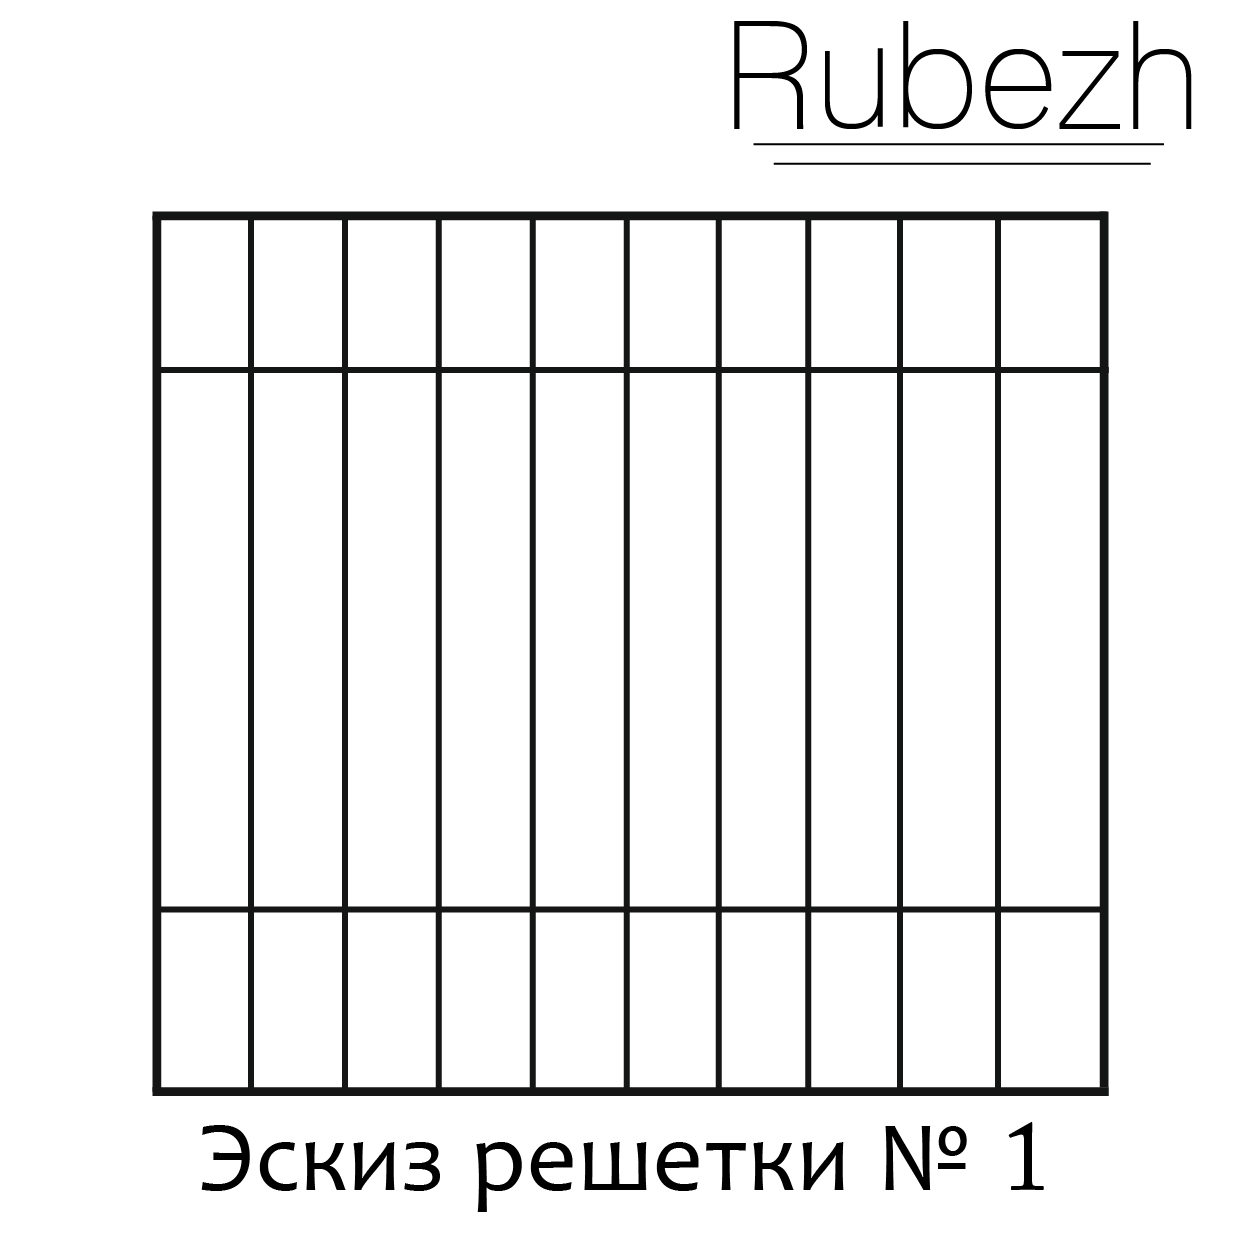 Эскиз решетки №1